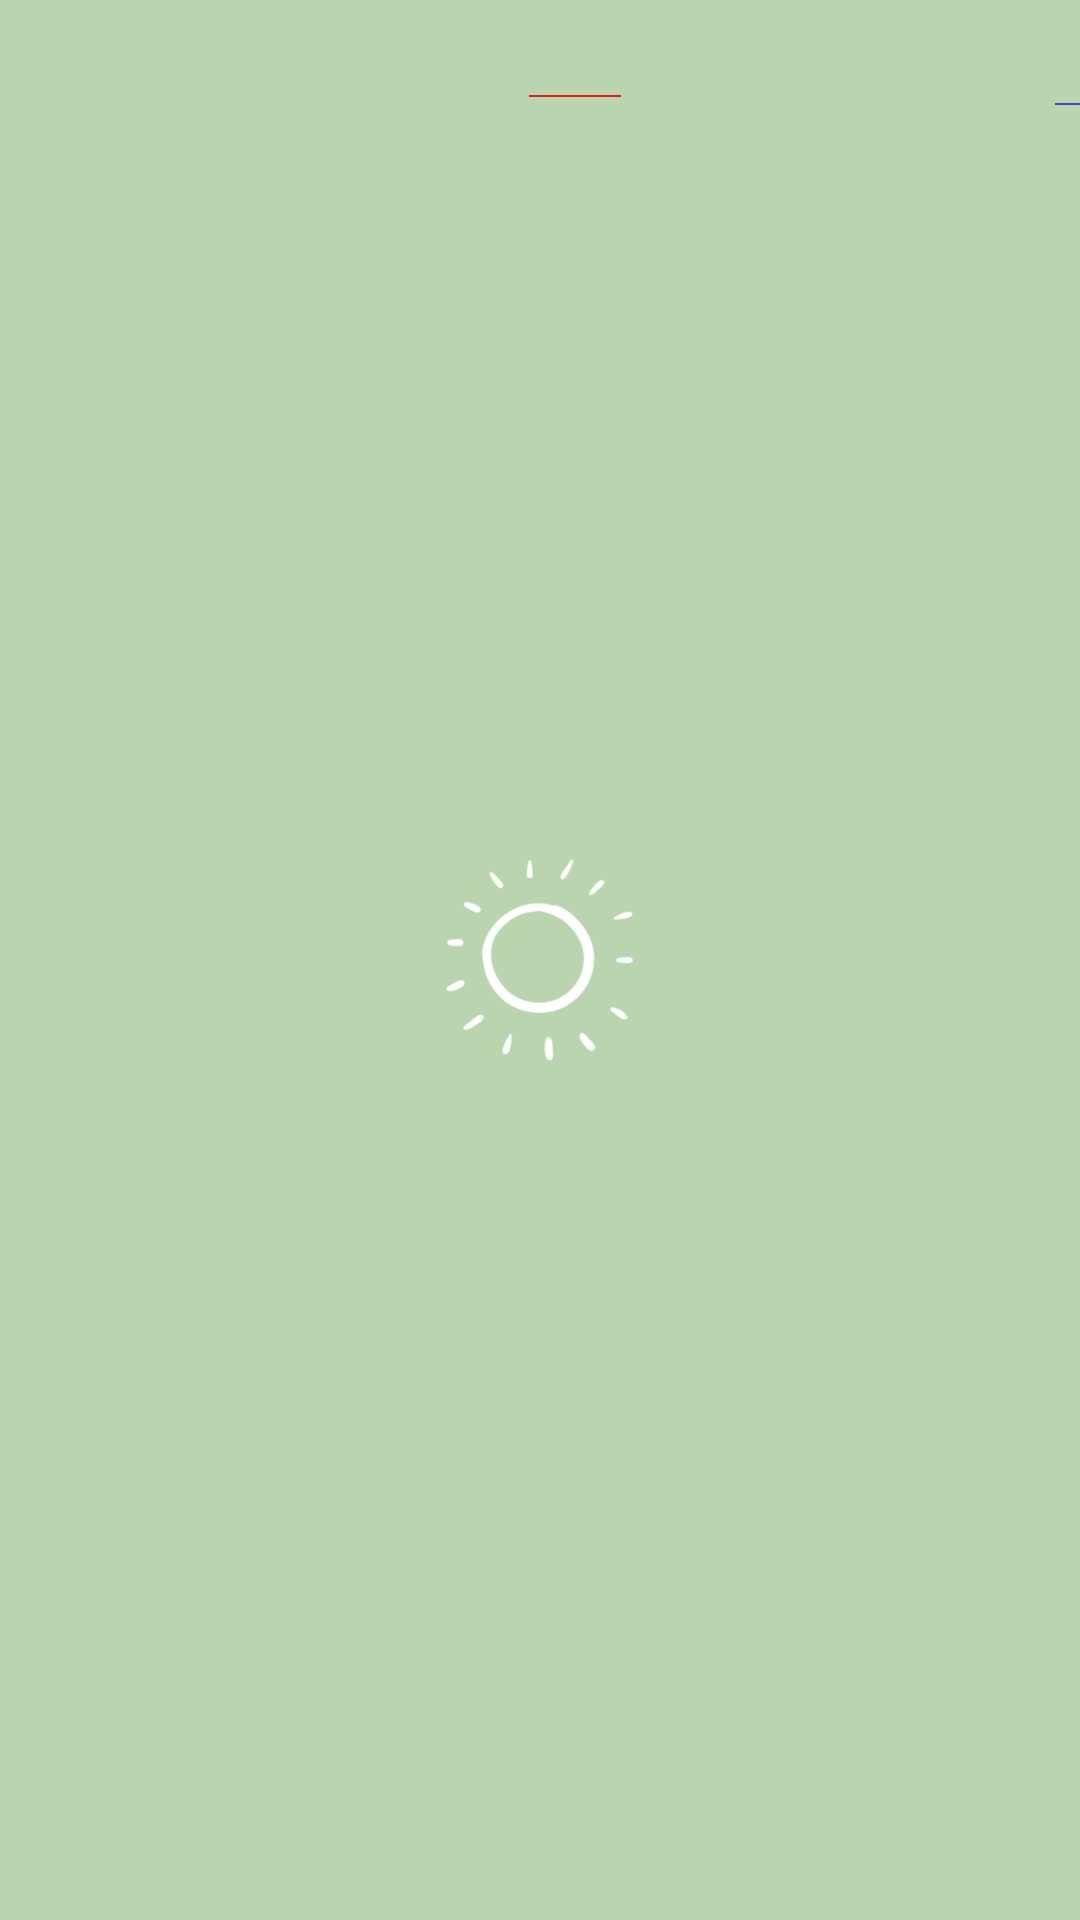 Aesthetic Minimalist Wallpaper Iphone Darkwallpaperiphone In 2020 Minimalist Wallpaper Iphone Wallpaper Green Green Aesthetic